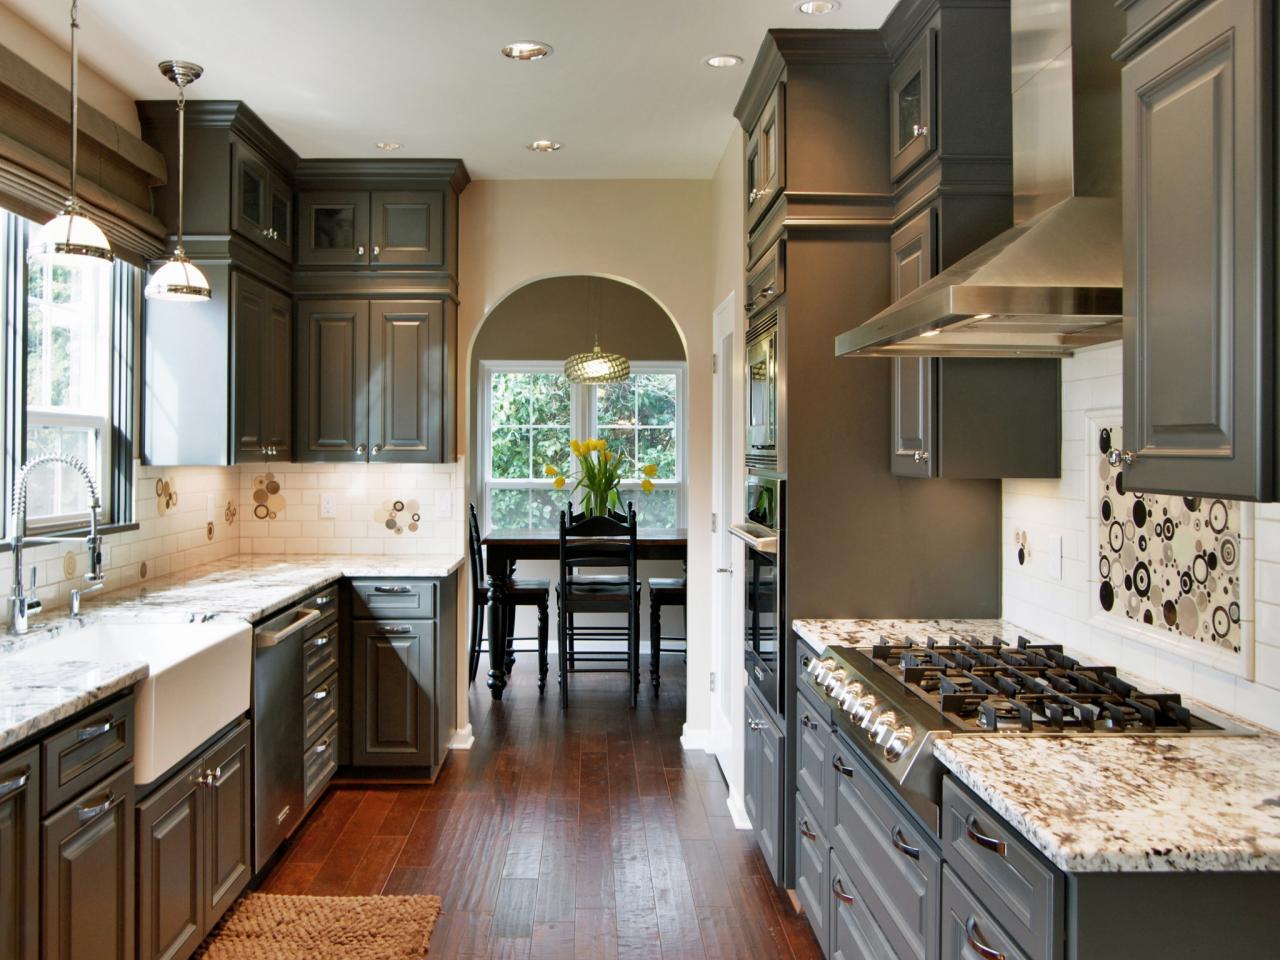 black kitchen cabinets tags: PAKPDGF